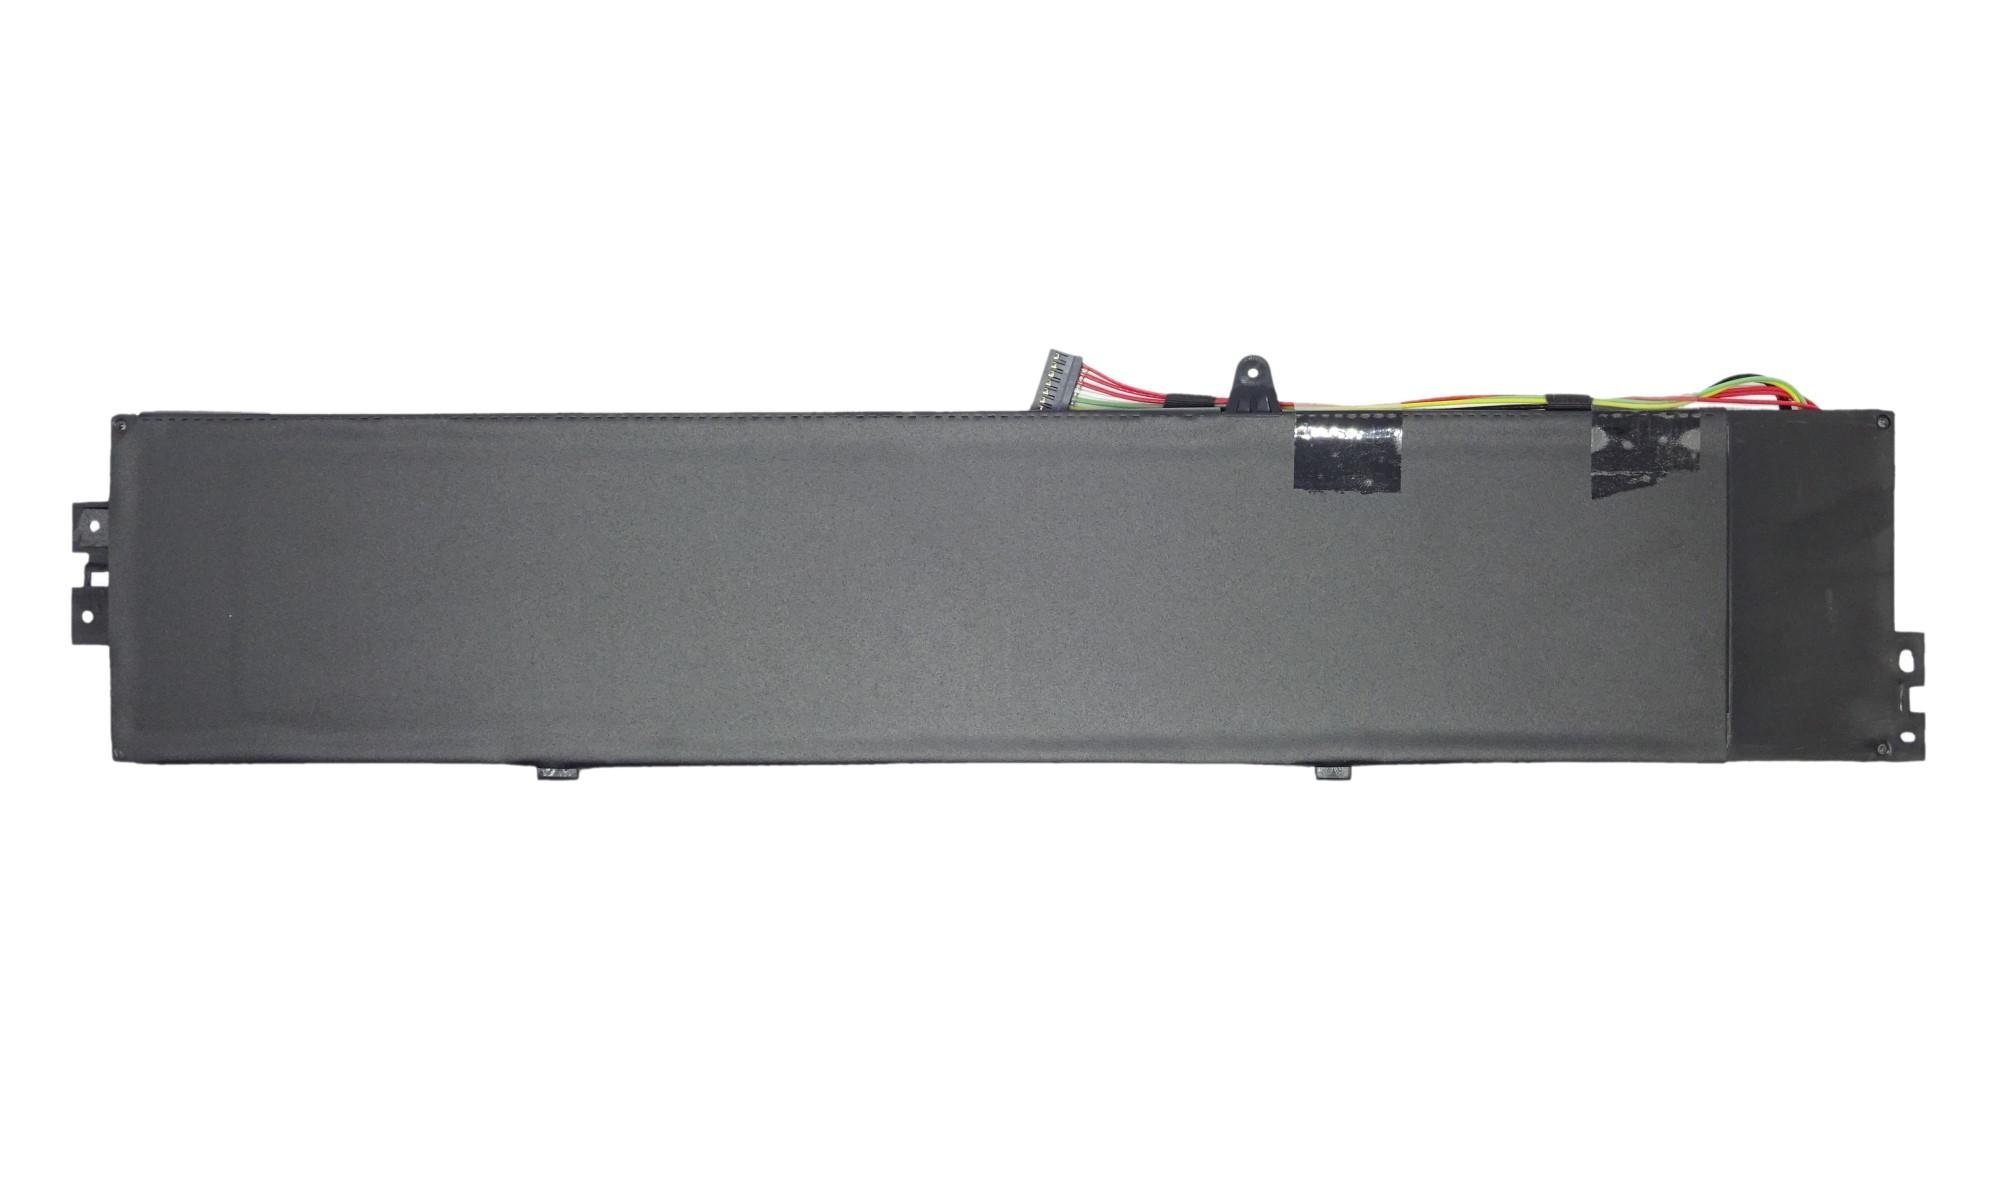 Baterie compatibila Lenovo ThinkPad S431, S440, 14.7V, 3100mAh, 46Wh